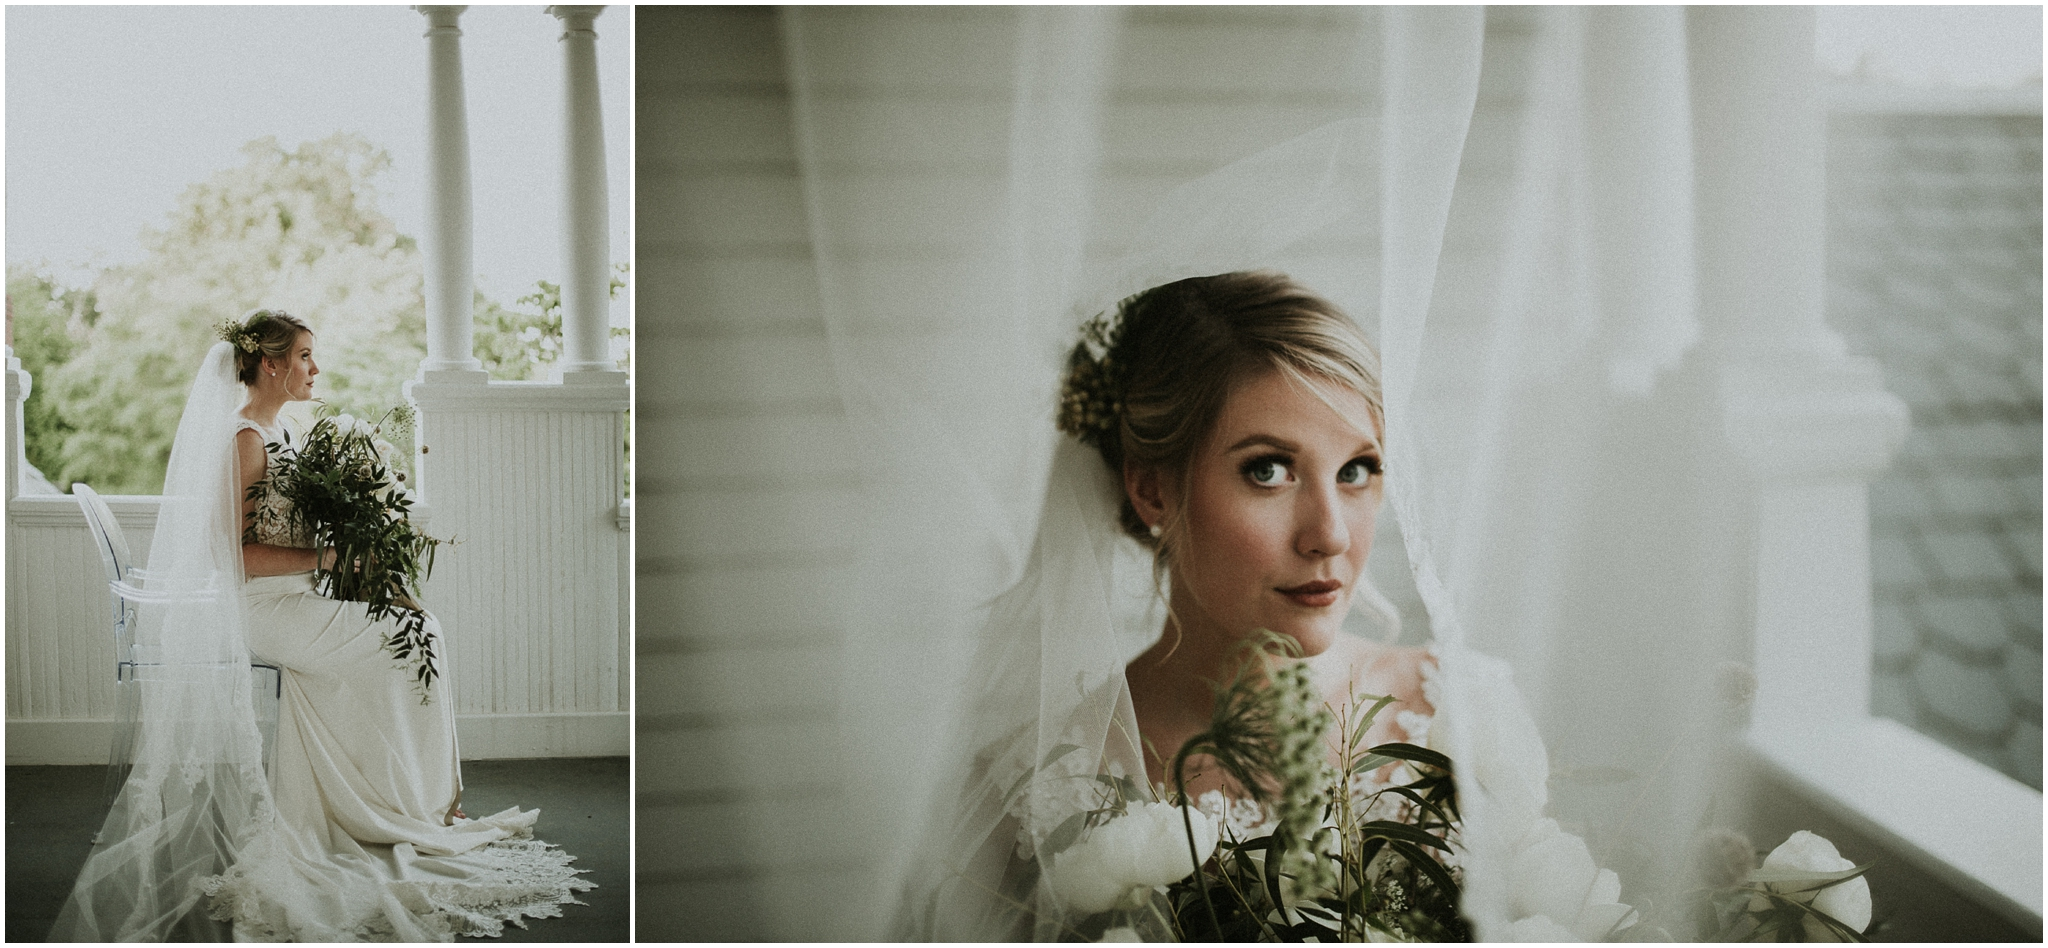 Wedding-photographer-ritchie-hill_0026.jpg